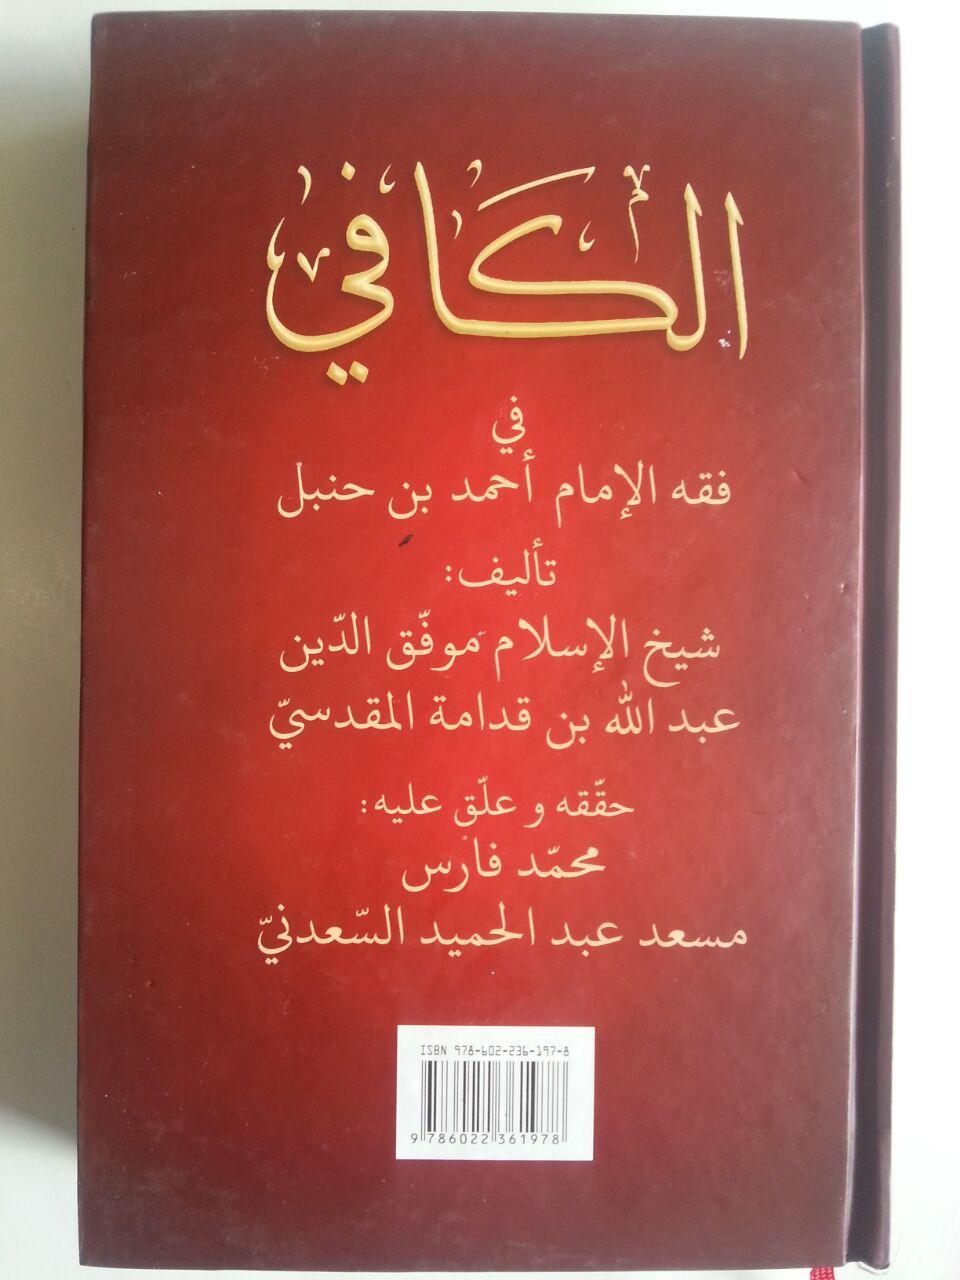 Buku Al Kafi Fikih Imam Ahmad Al Hanbali Jilid 1 cover